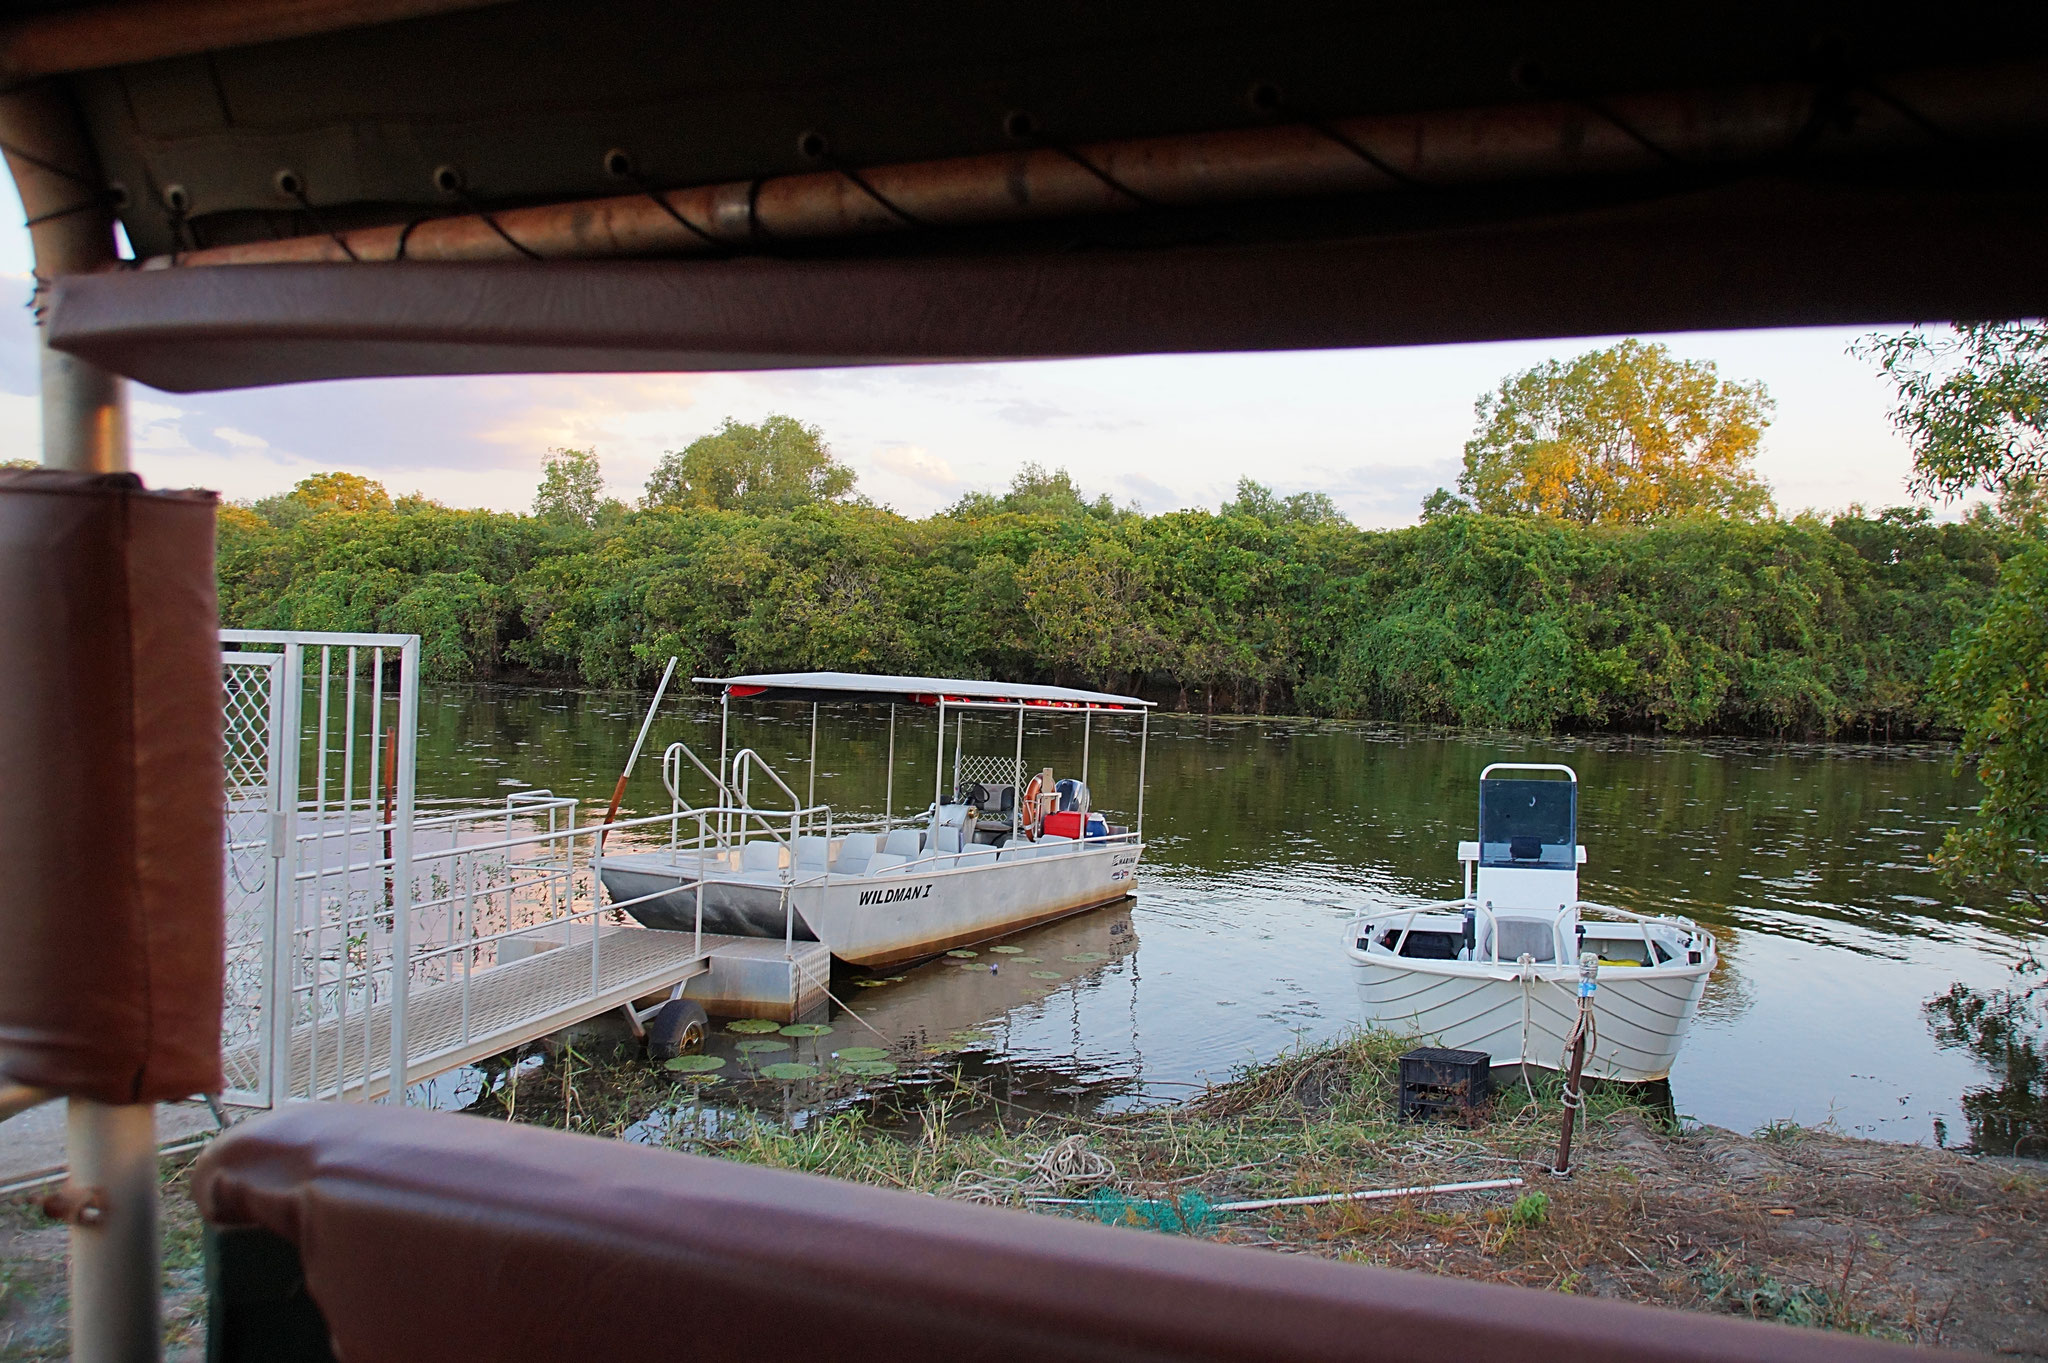 Mit dem Ausflugsboot kann man den Home Billabong erkunden.